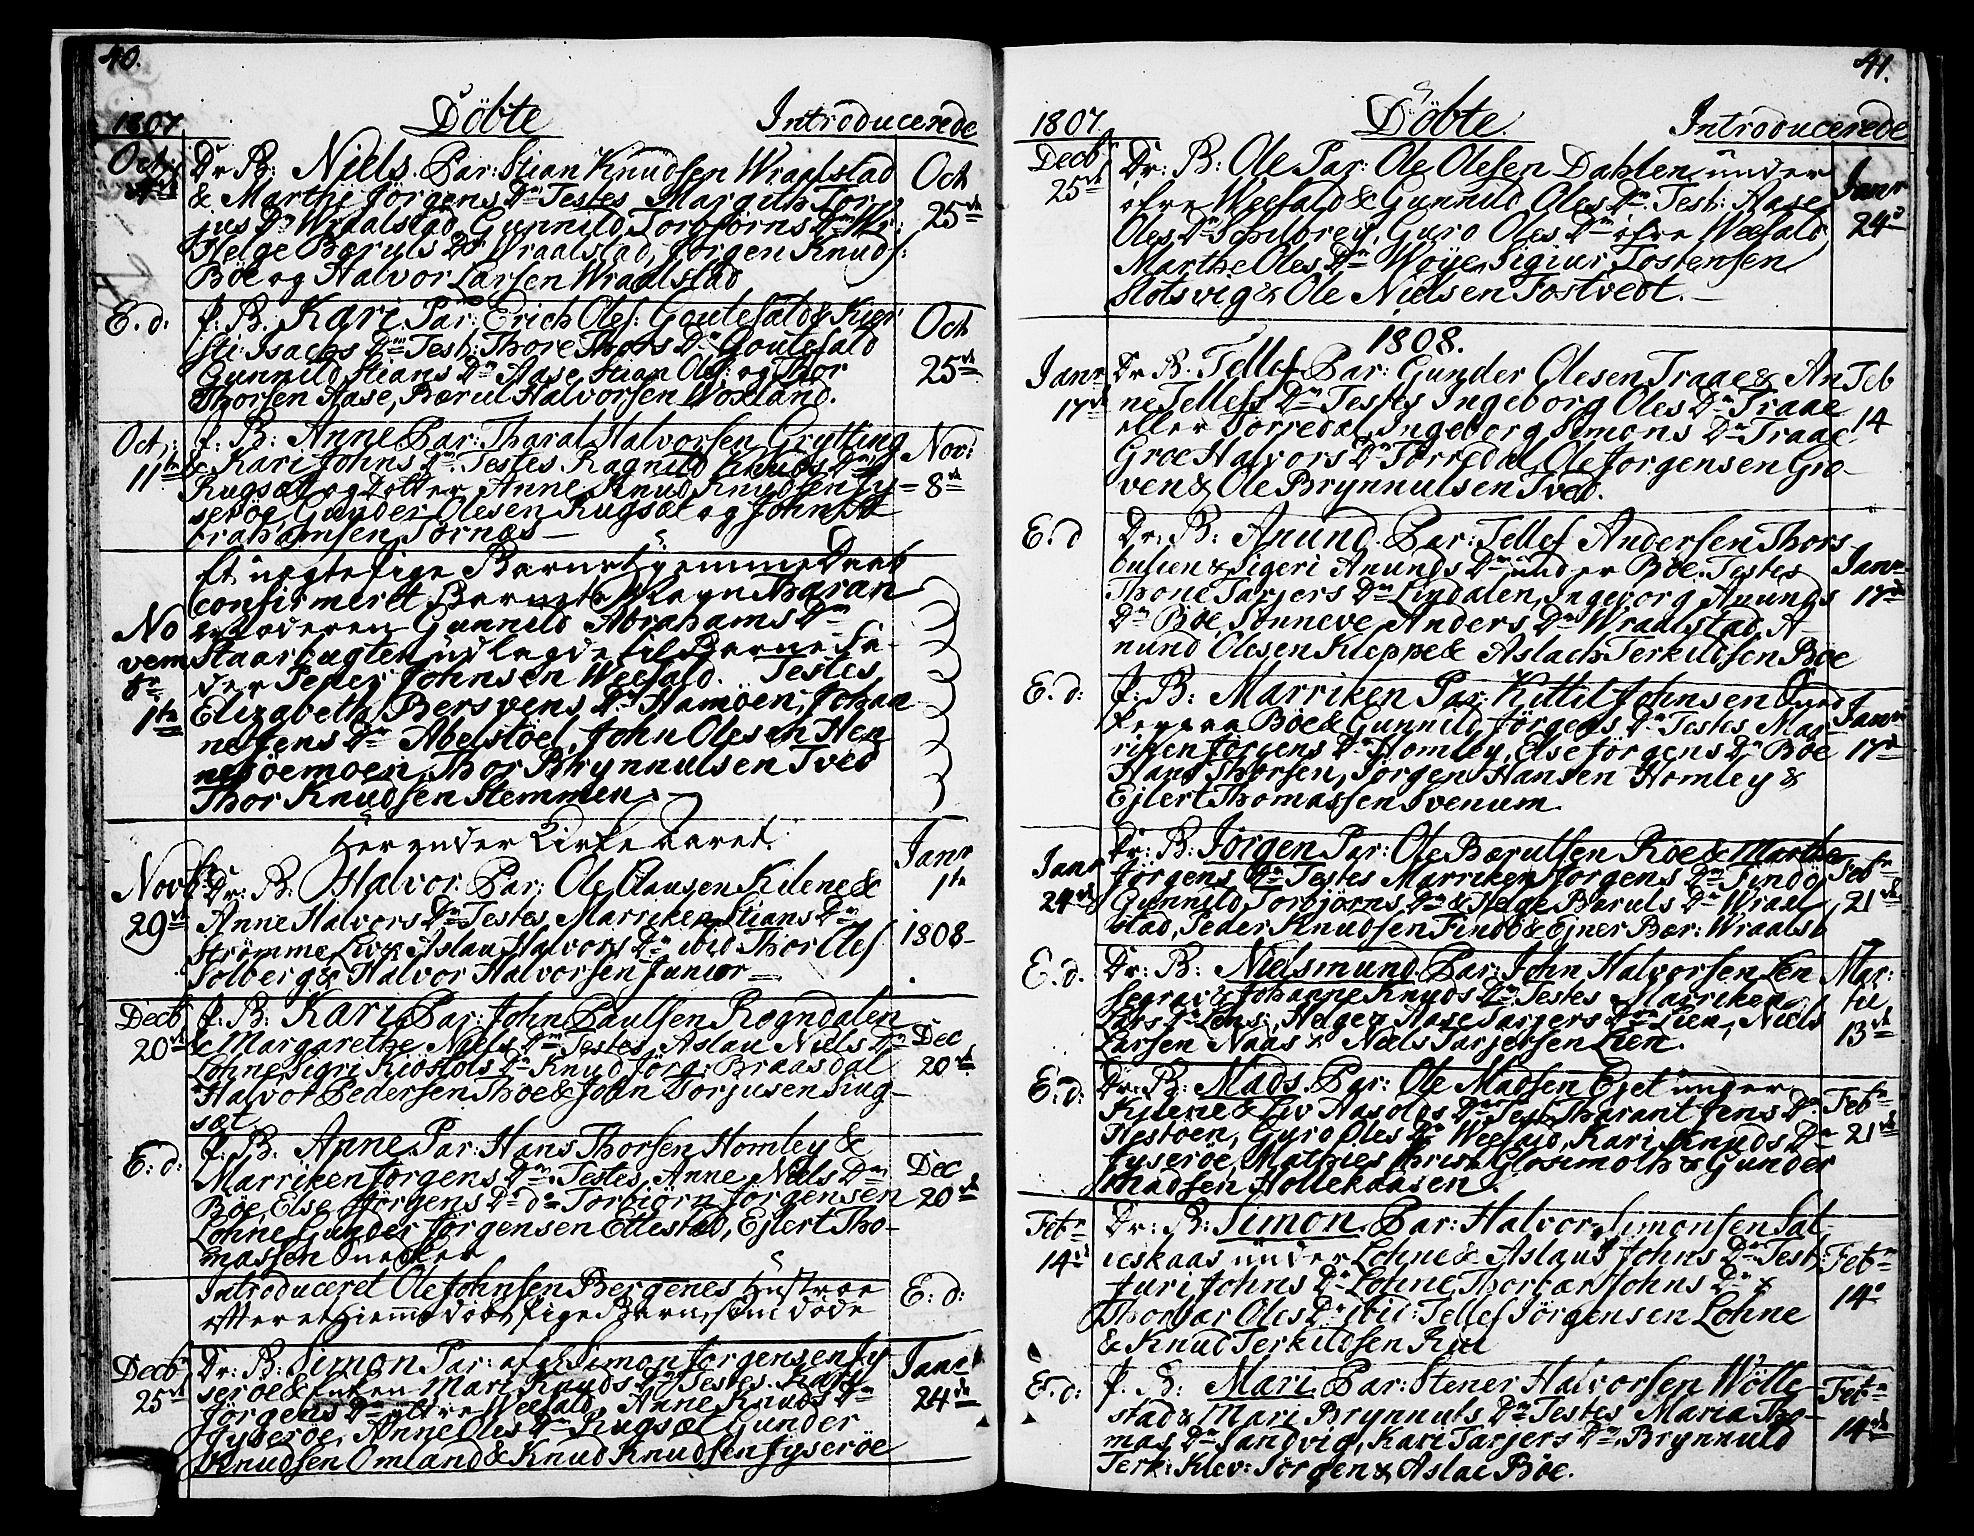 SAKO, Drangedal kirkebøker, F/Fa/L0004: Ministerialbok nr. 4, 1802-1814, s. 40-41